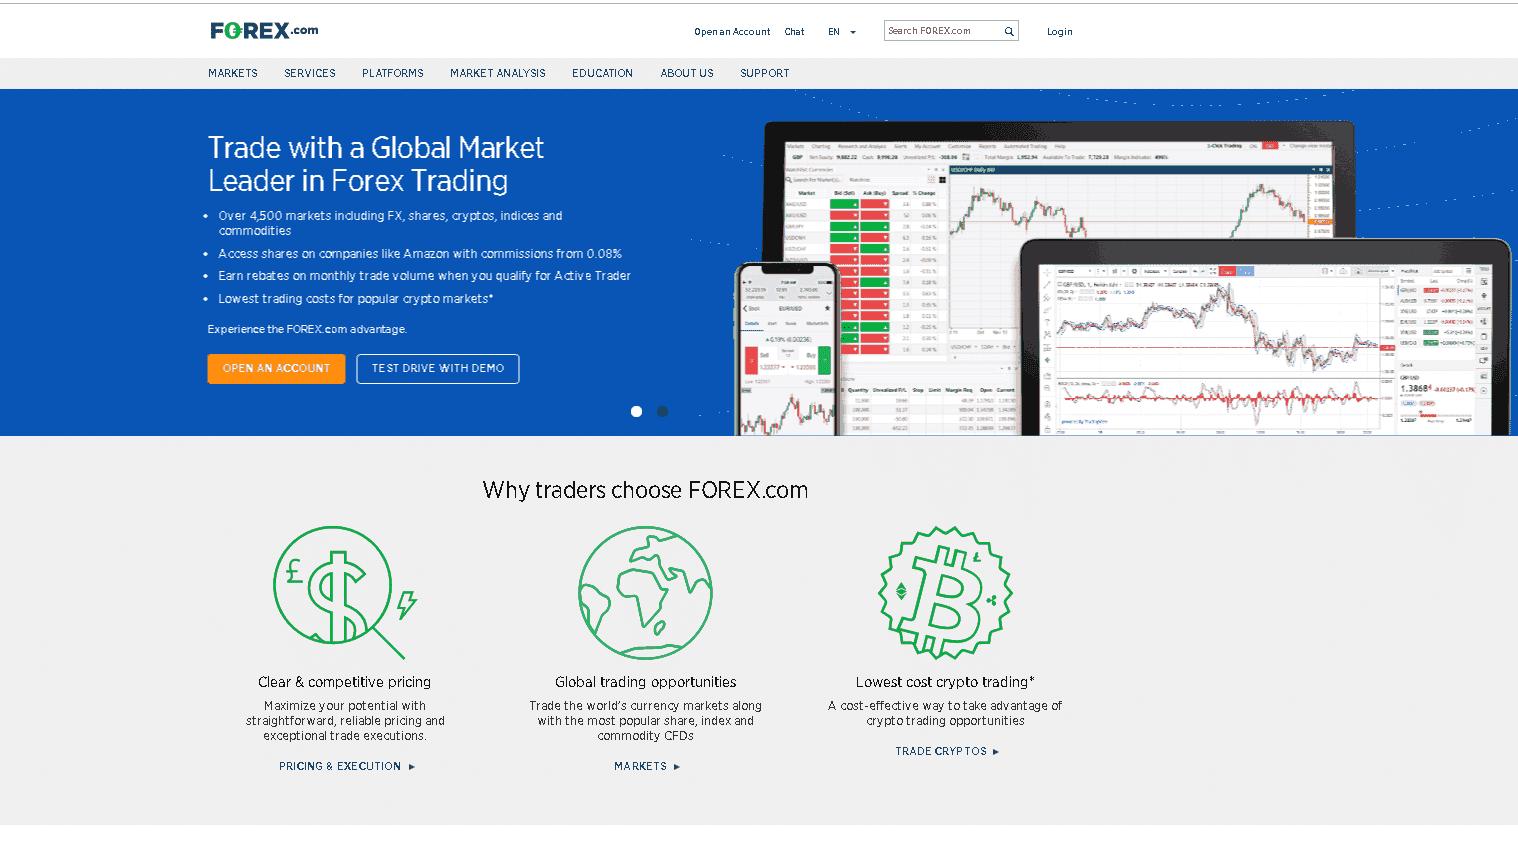 forex com Review - Leading Trading Platforms